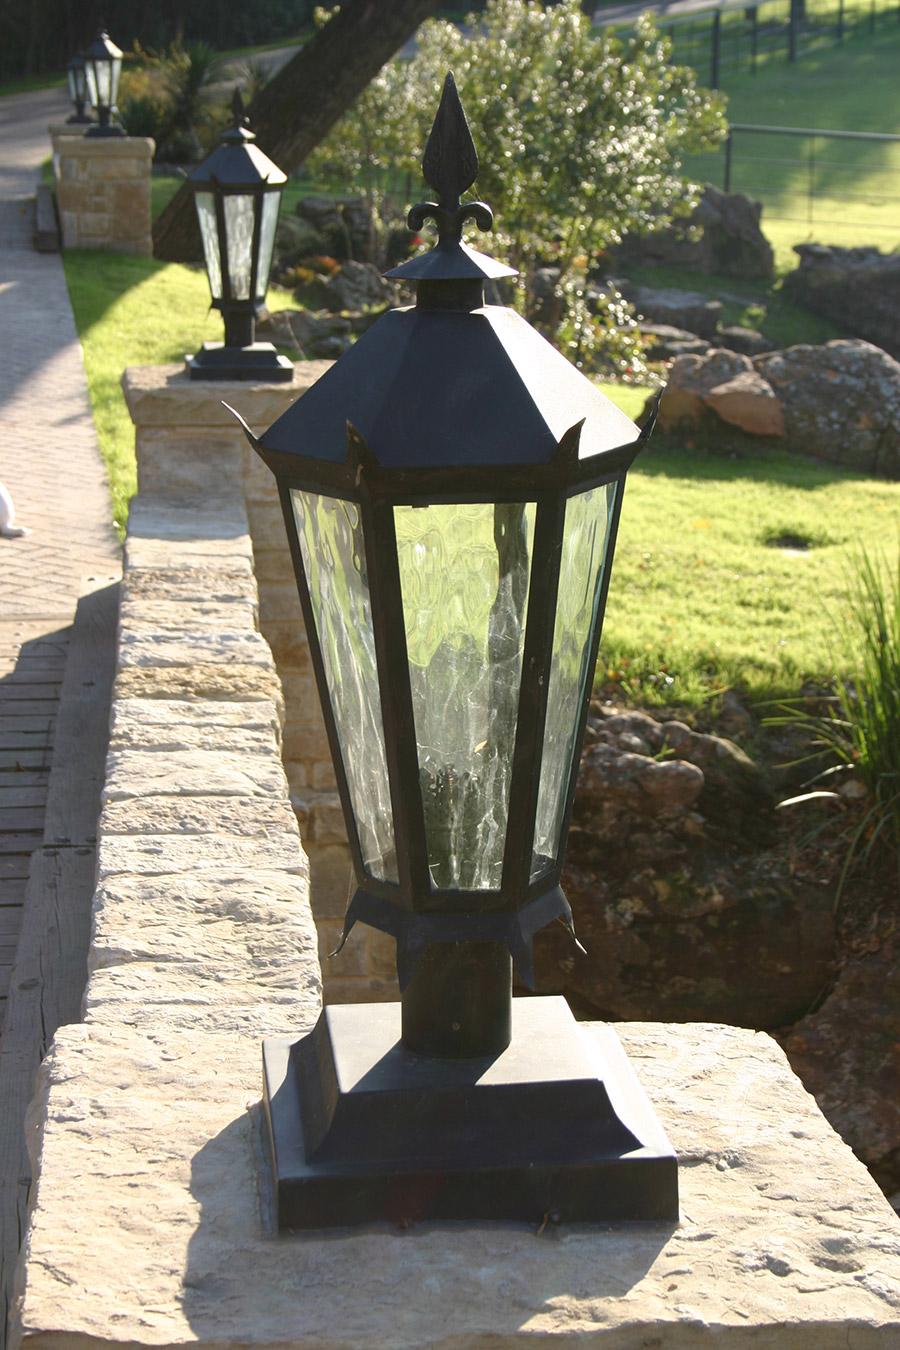 Viking-iron-lighting-fixture-foyer-hall-pendant-entry-kitchen-solara-ligthing-C002-062-EG-(13)